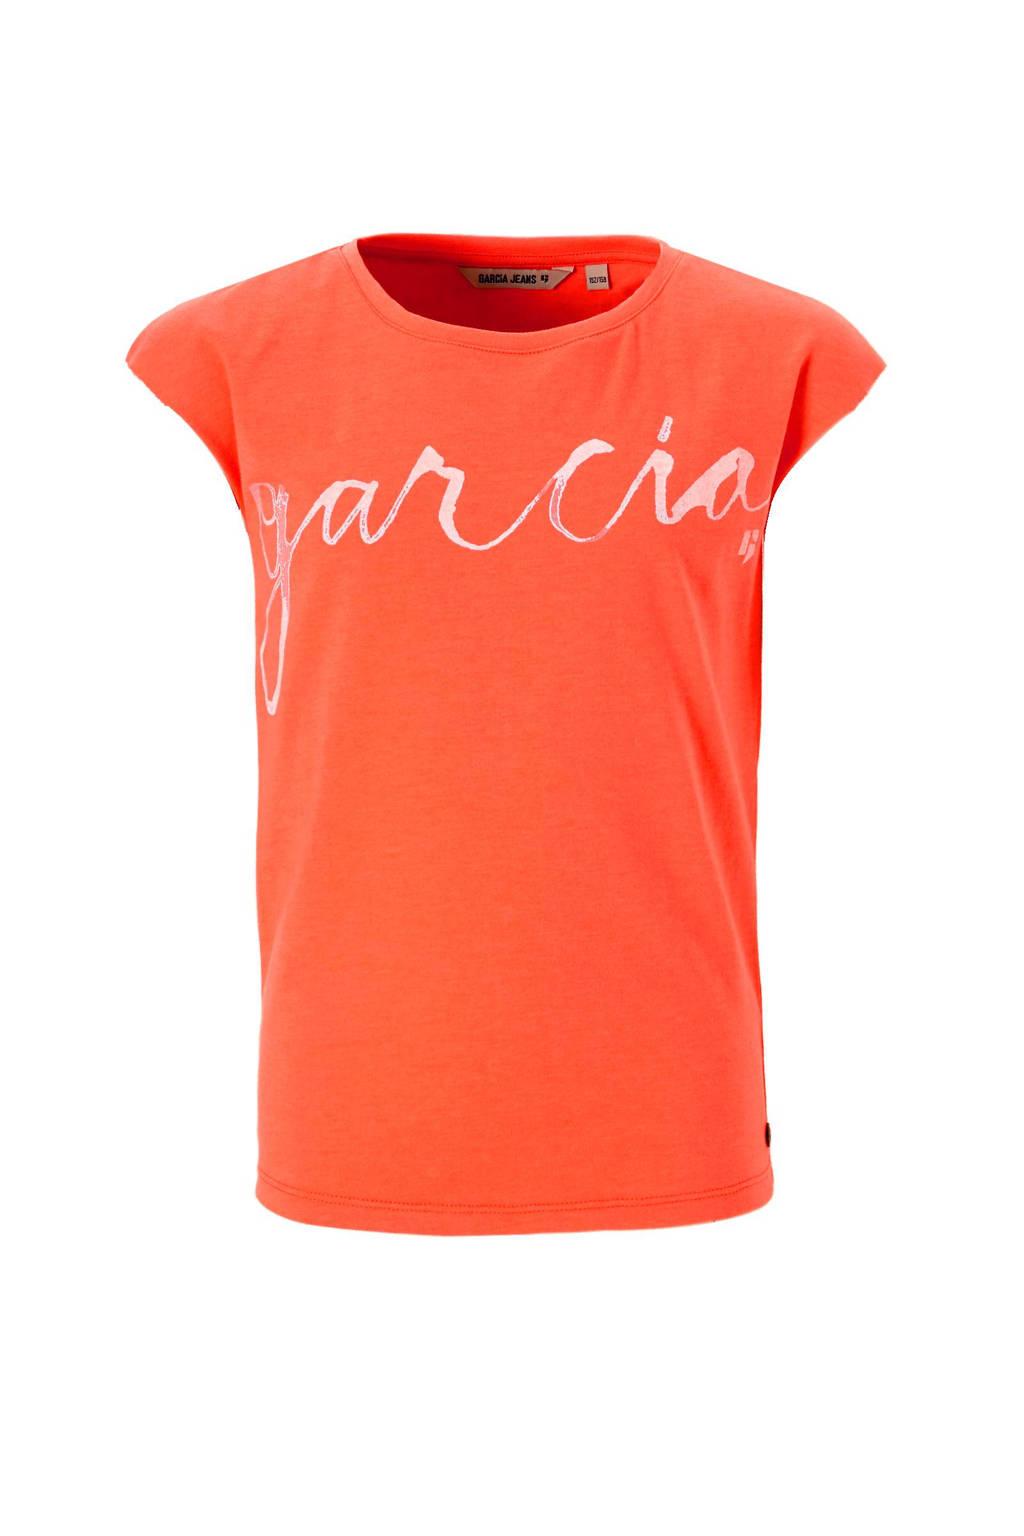 Garcia T-shirt, Neon oranje